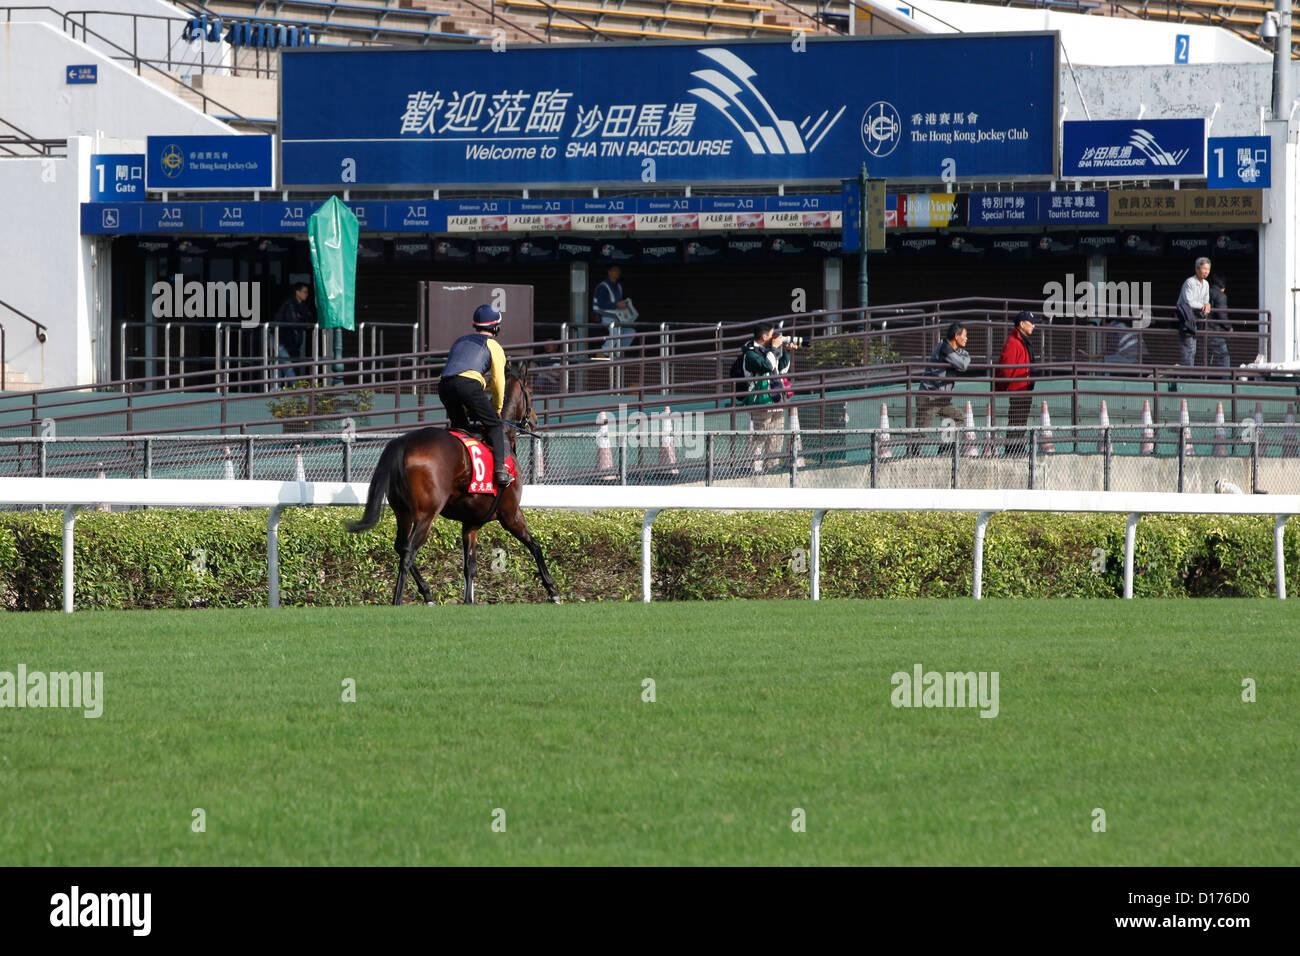 06.12.2012 - Hongkong; Feuerblitz, ridden by Sandor Hegedues during the morning track work. Credit: Lajos-Eric Balogh/turfstock.com - Stock Image